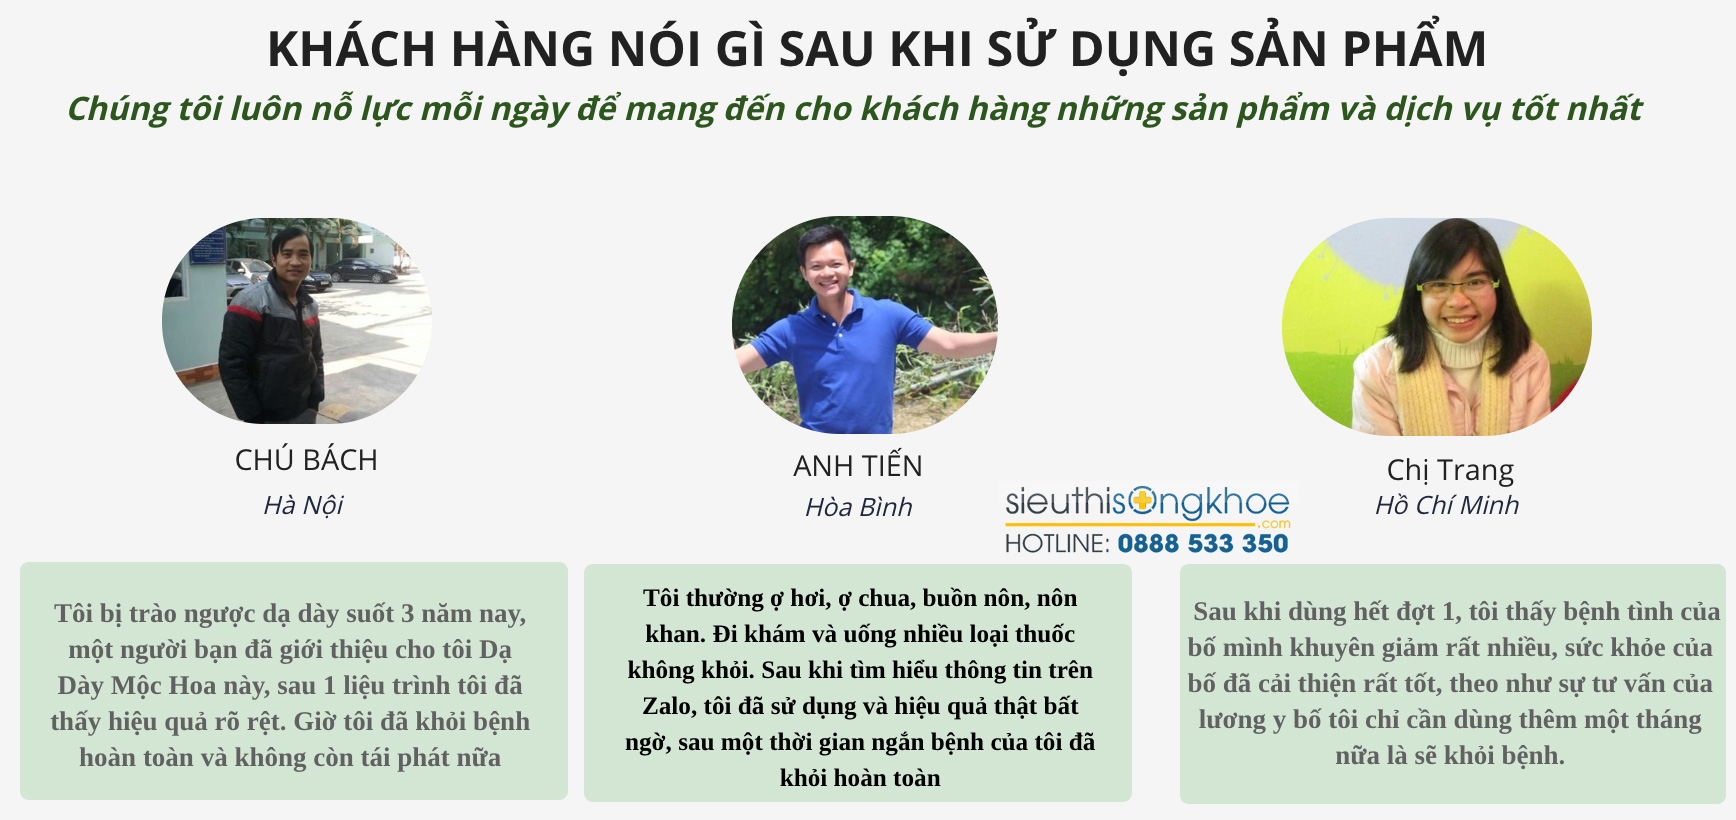 phan hoi khach hang da day moc hoa